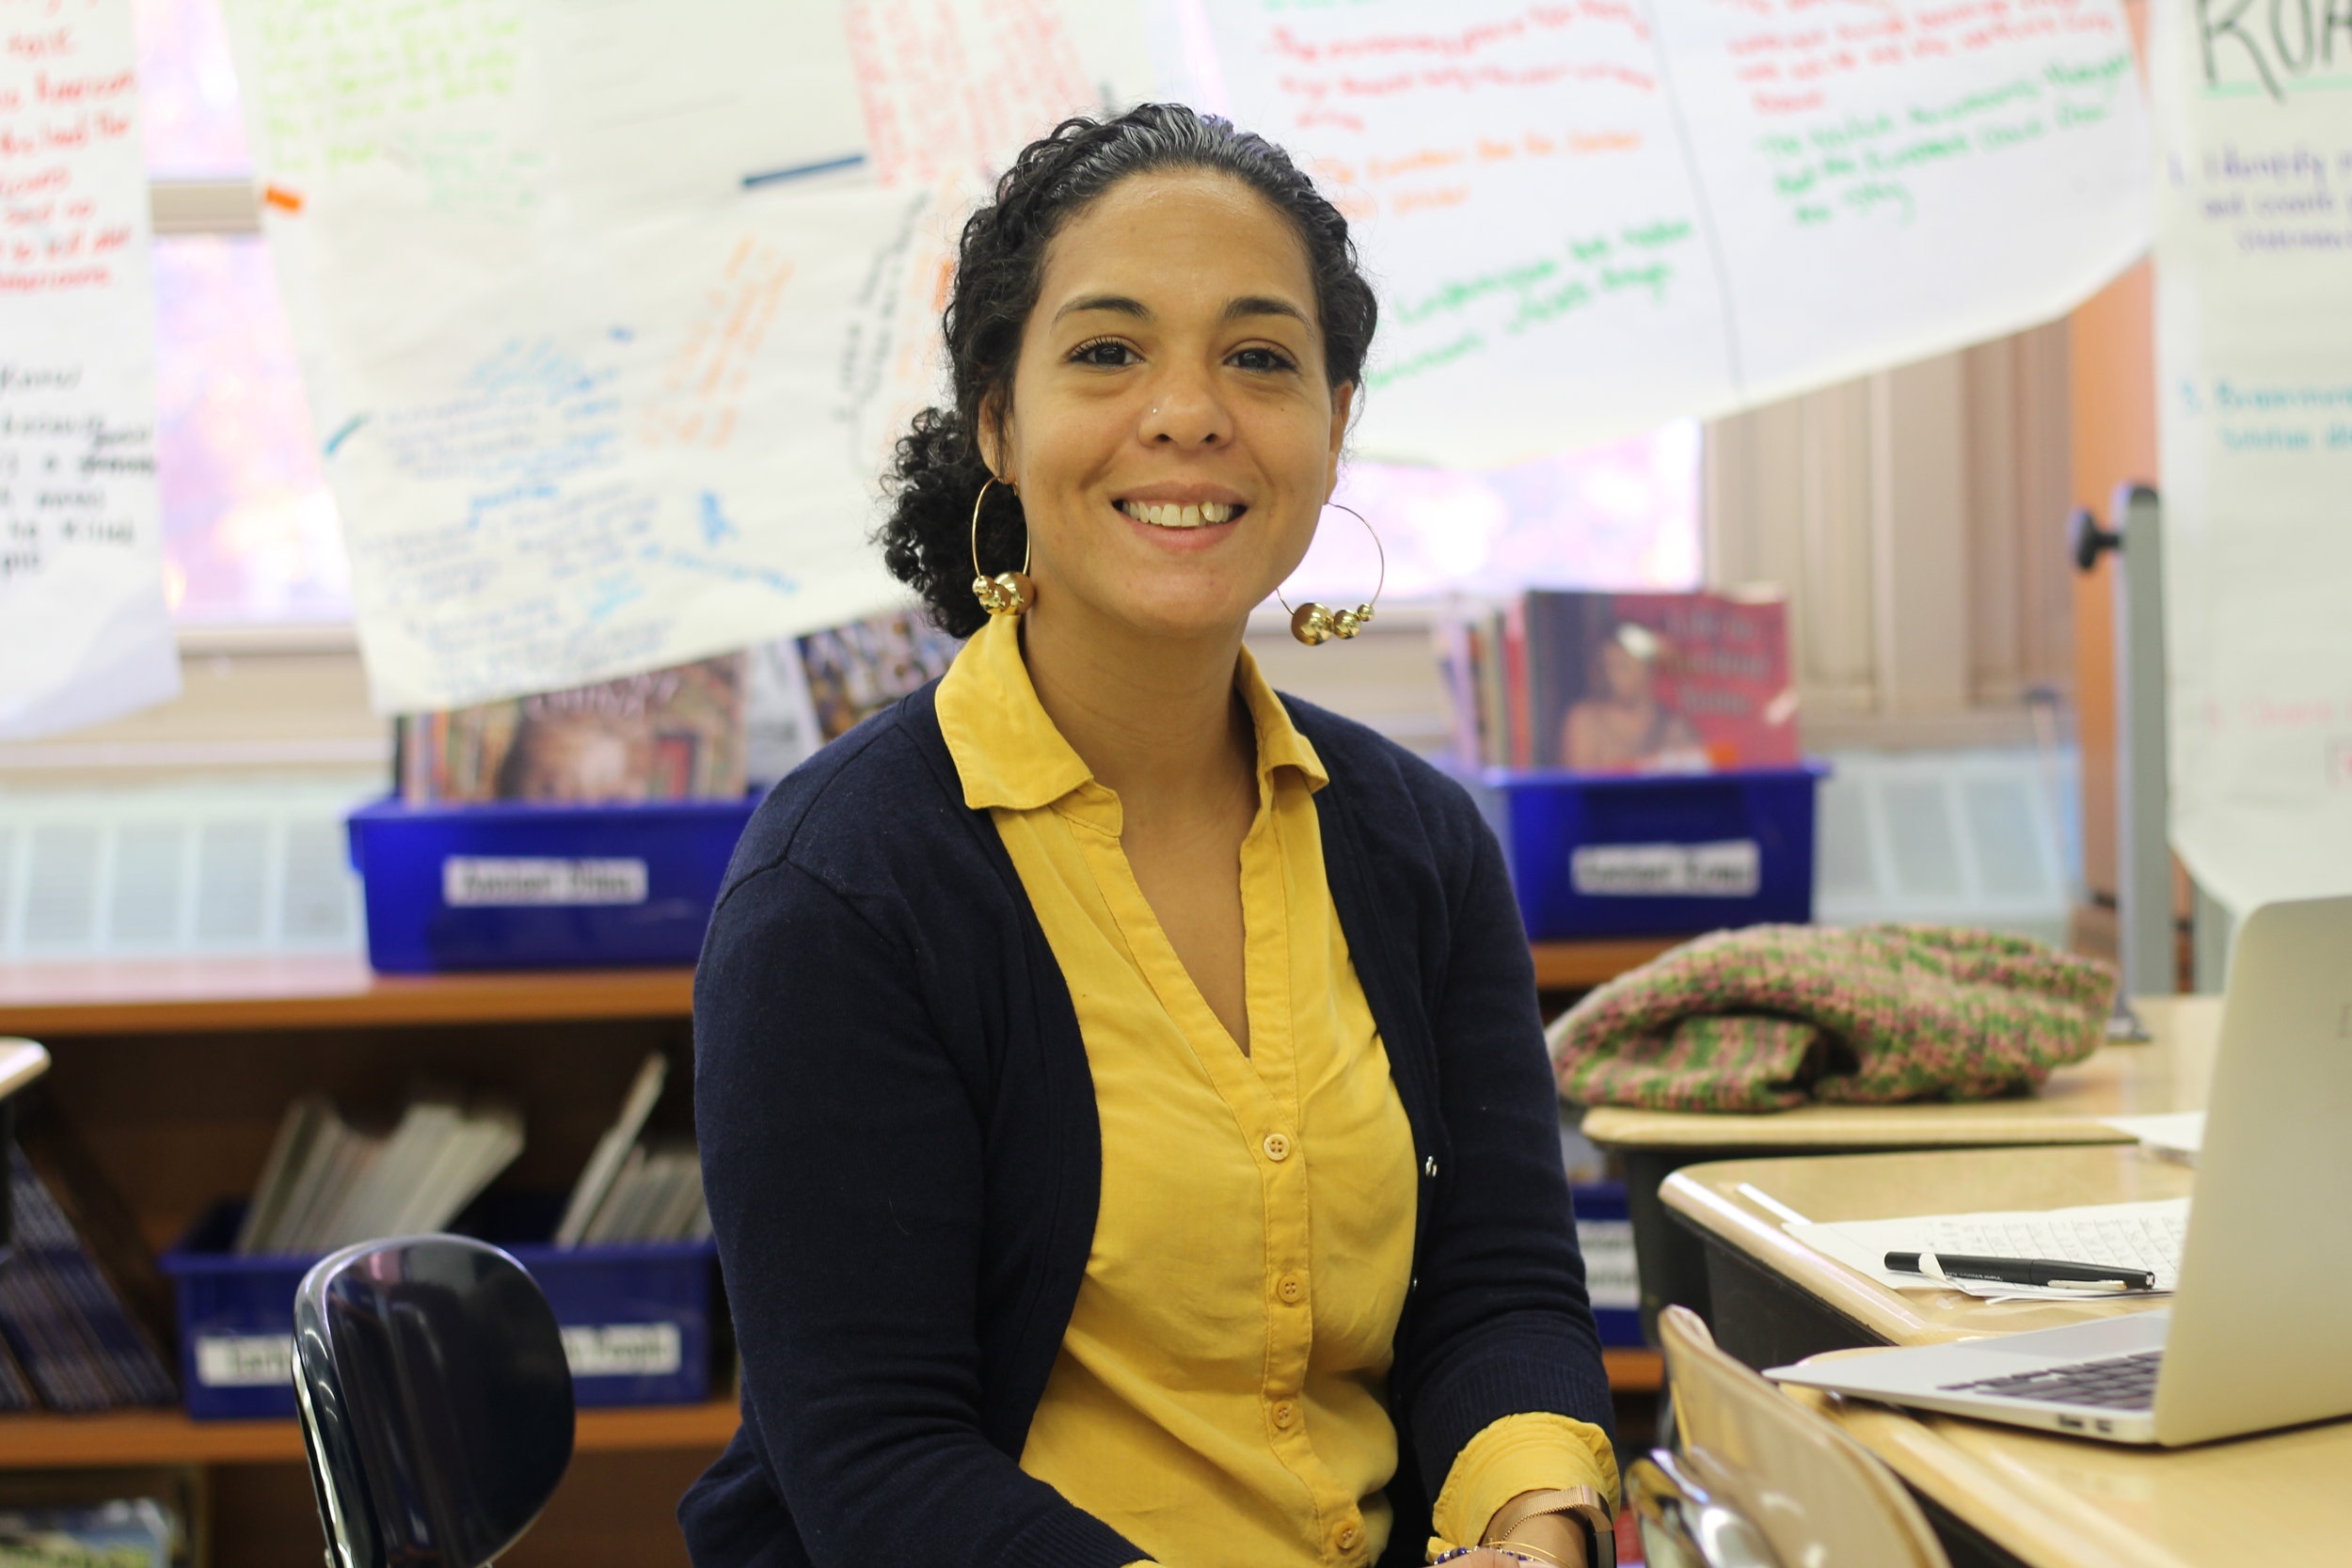 ROSIE ORENGO - 6th Social Studiesrosie.orengo@uaunisonschool.org